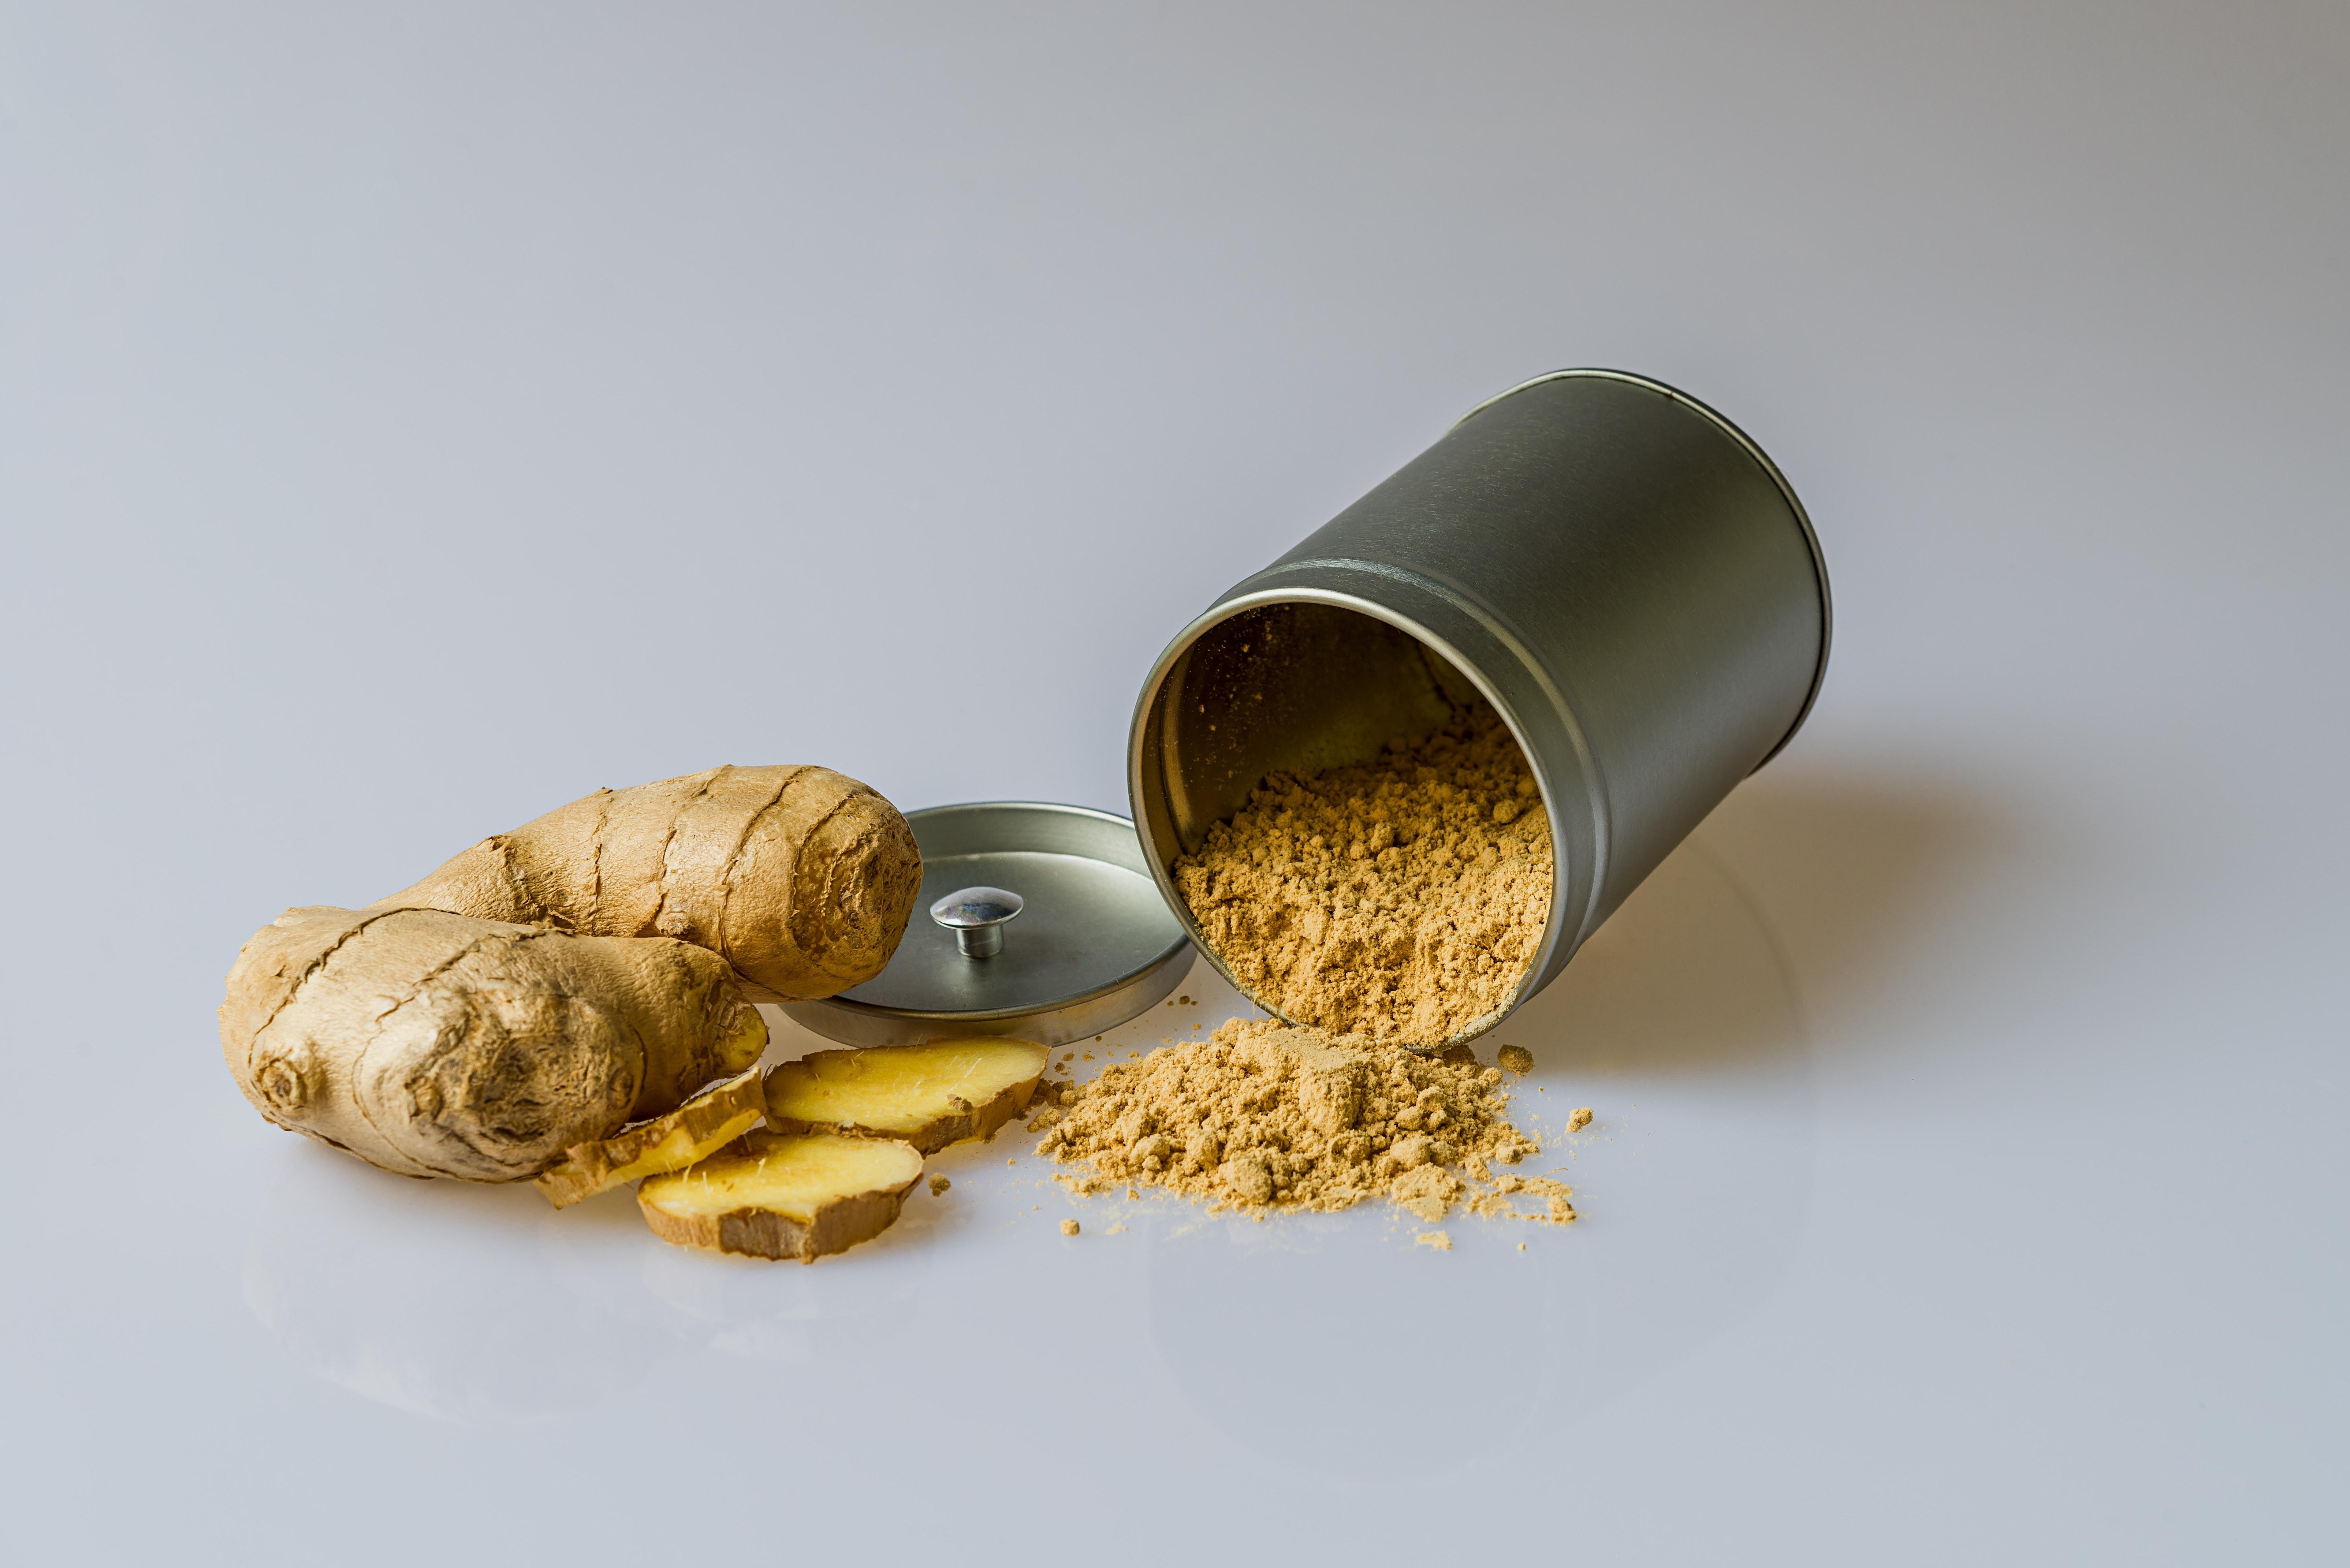 canister-food-ginger-161556 (1)